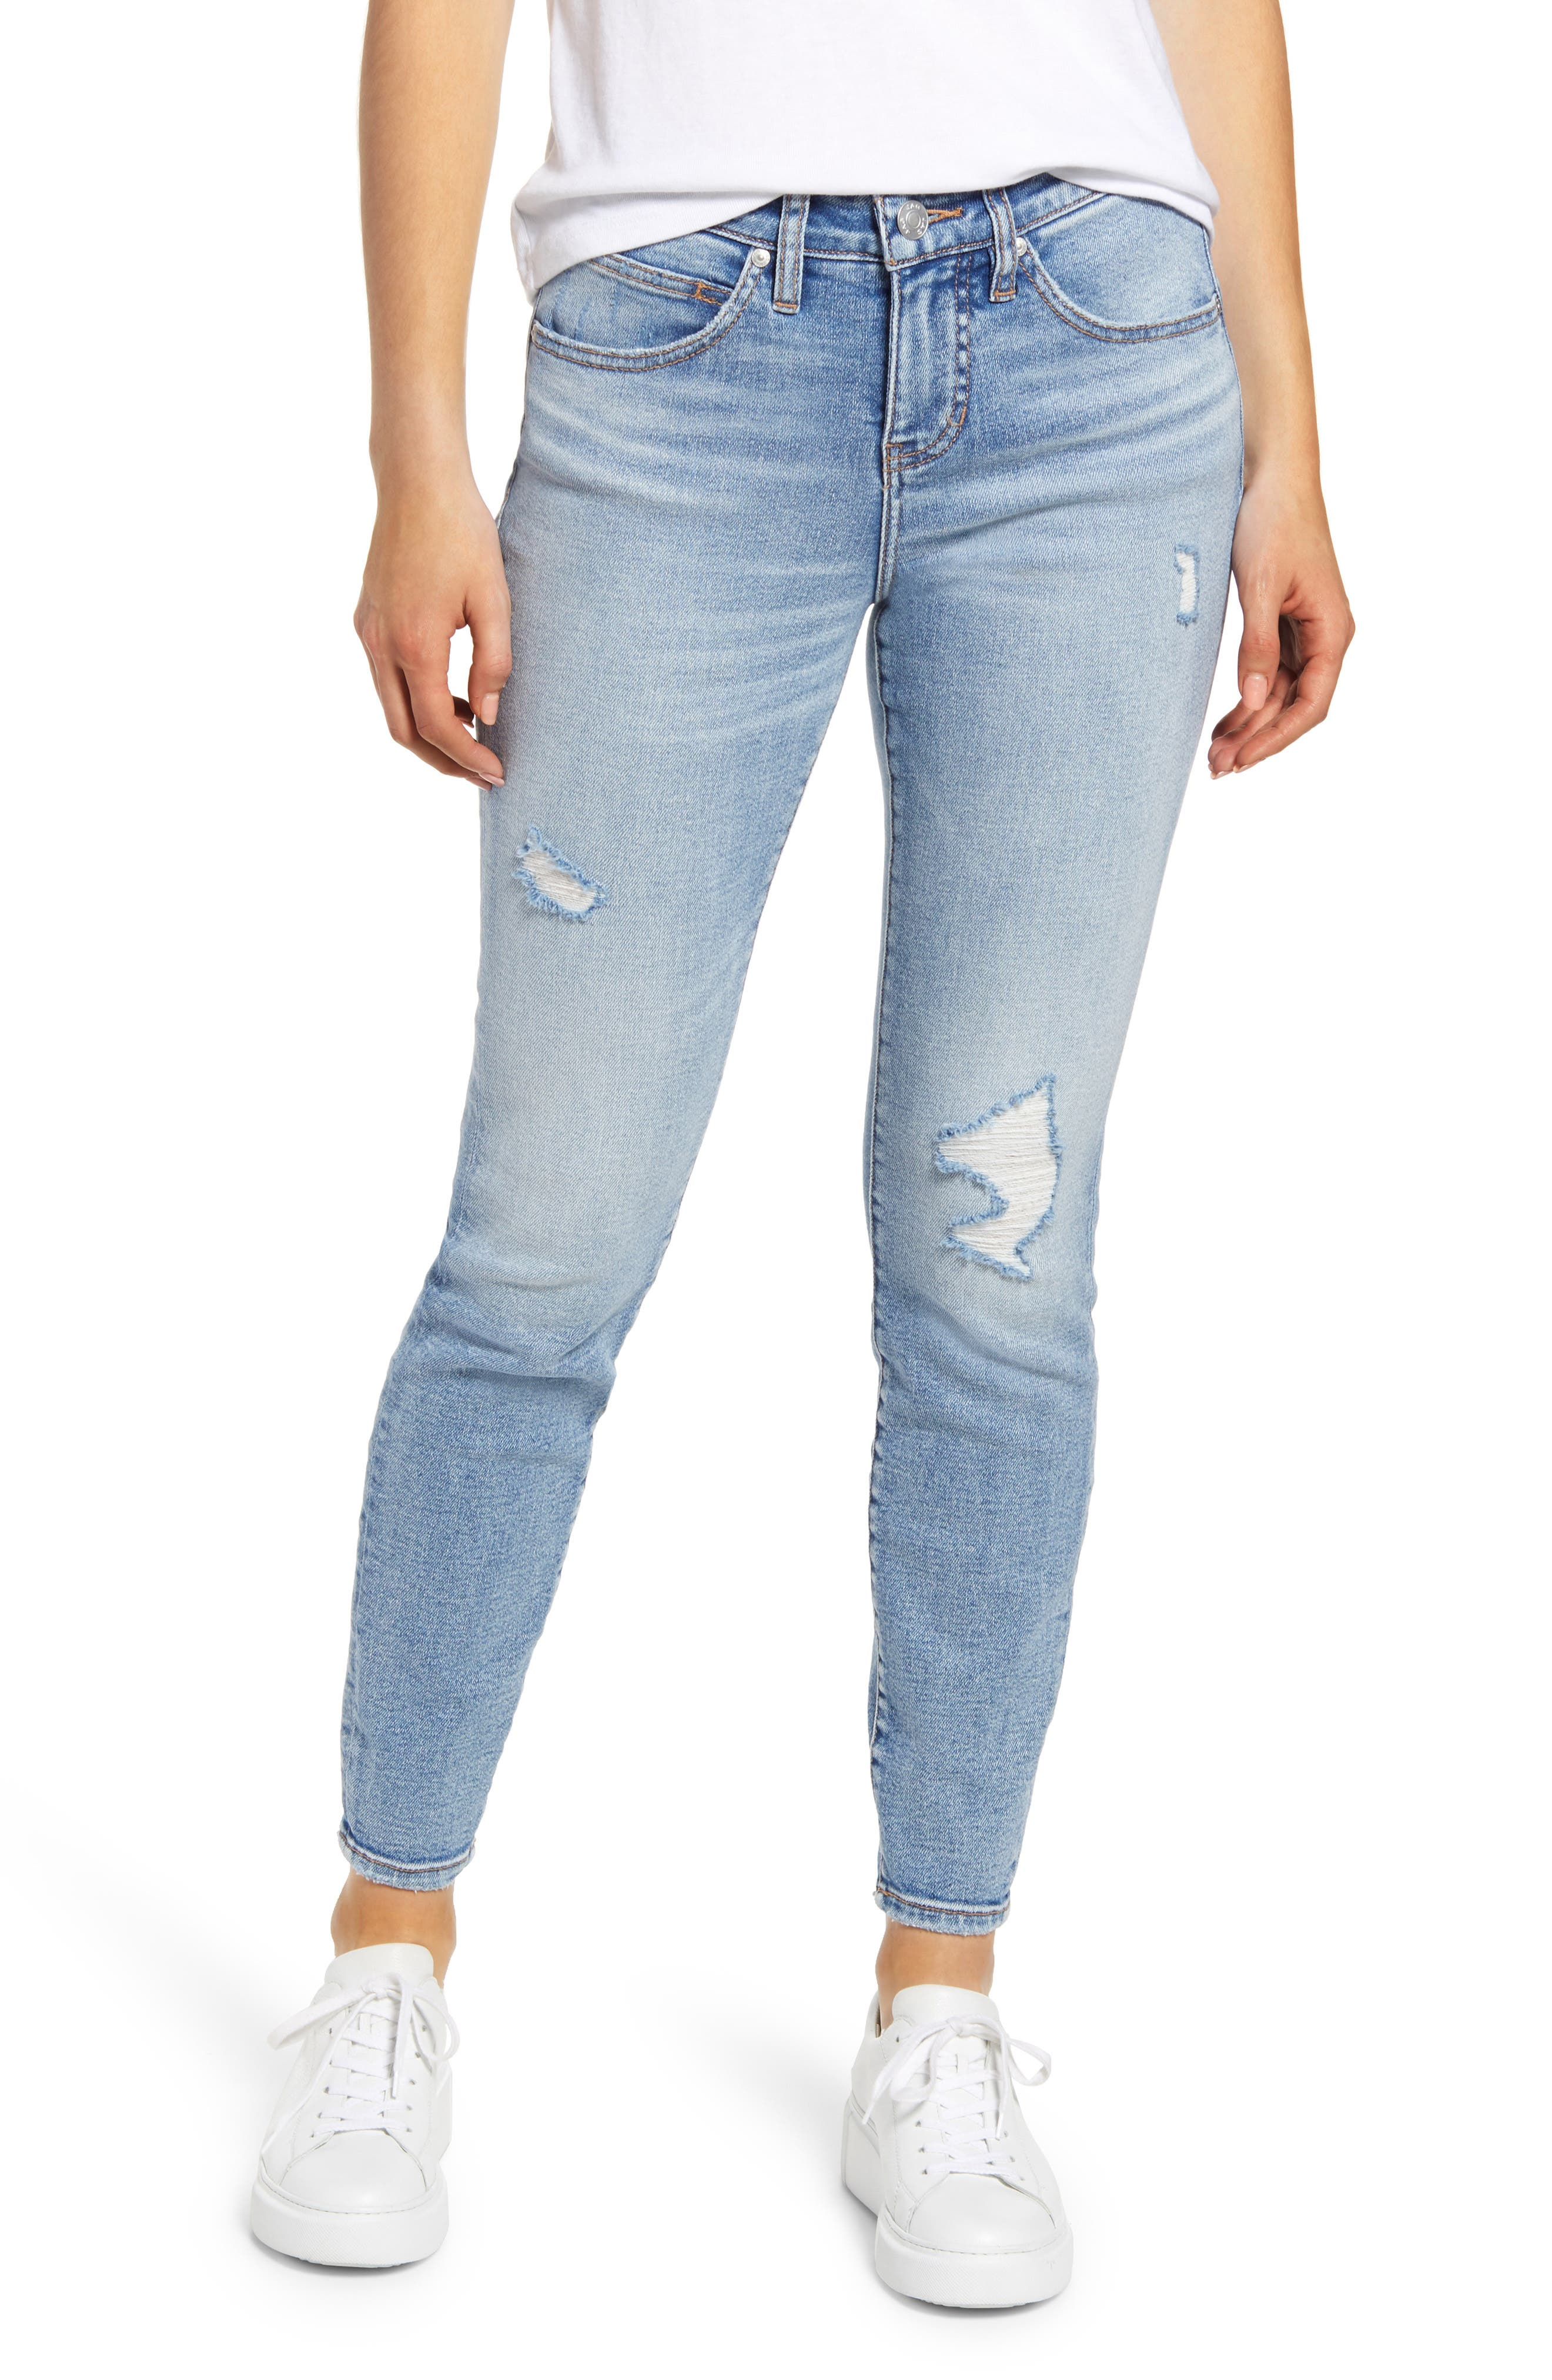 Cecilia High Waist Ankle Skinny Jeans